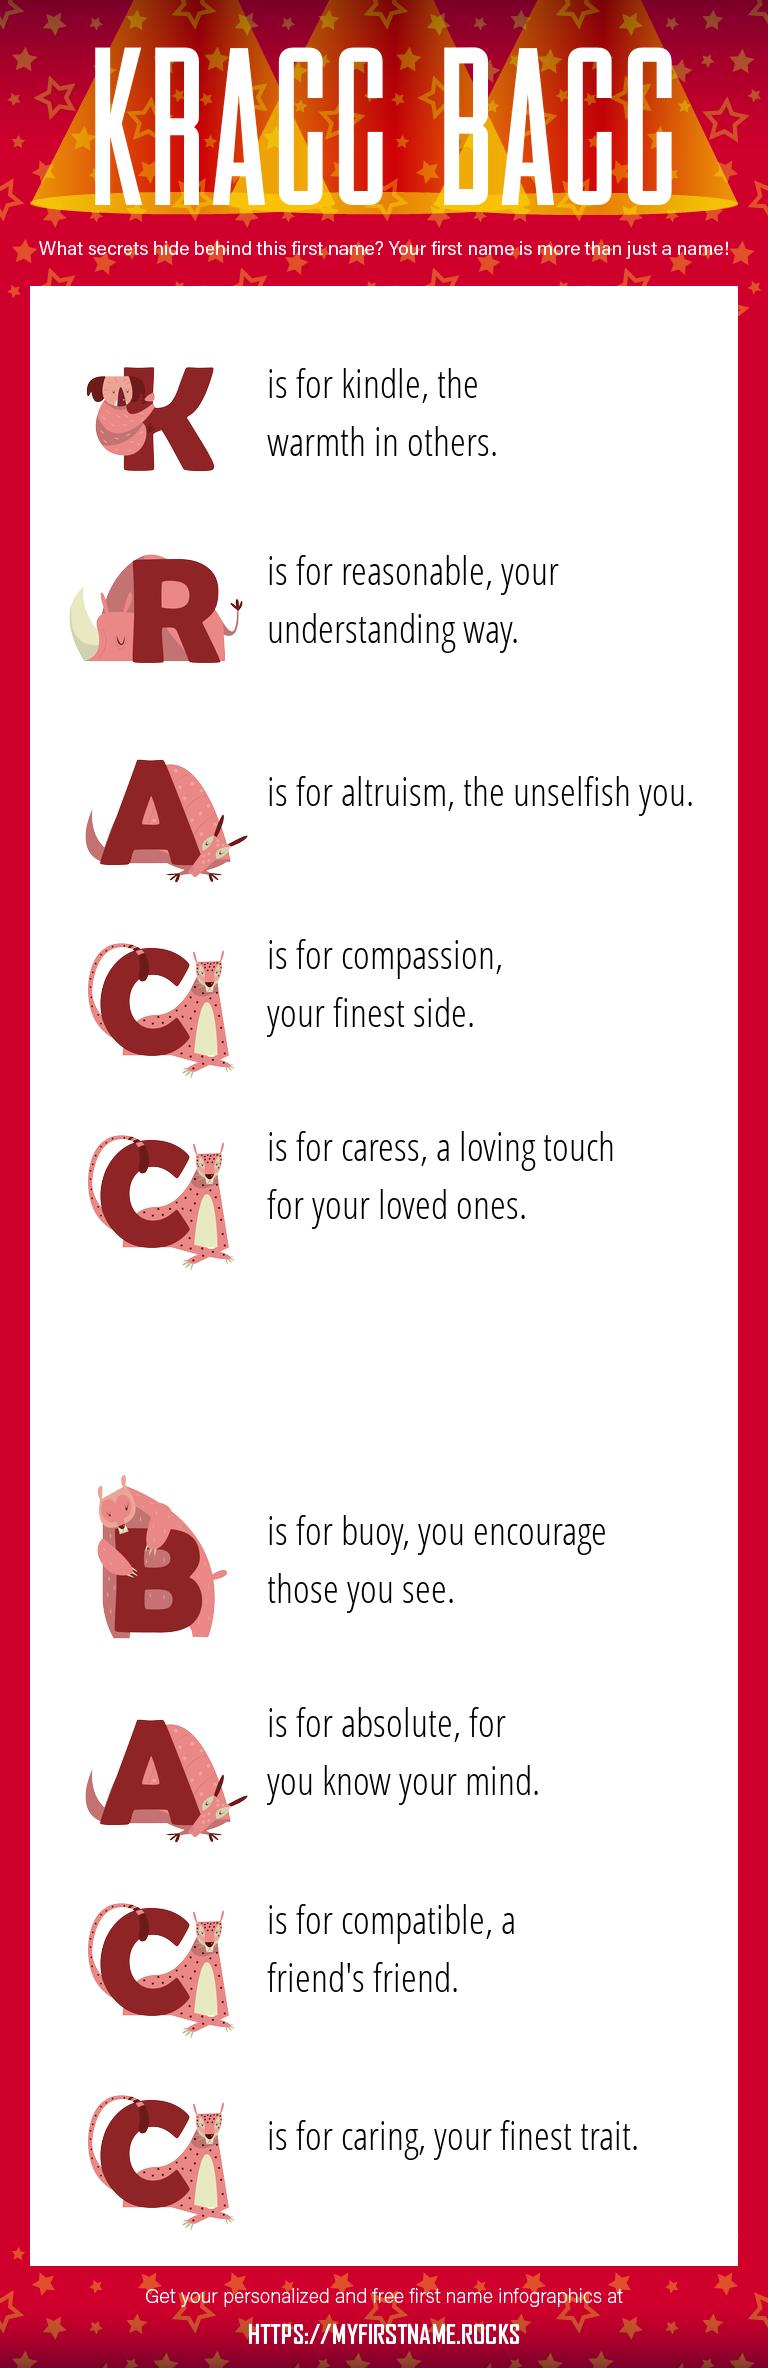 Kracc Bacc Infographics